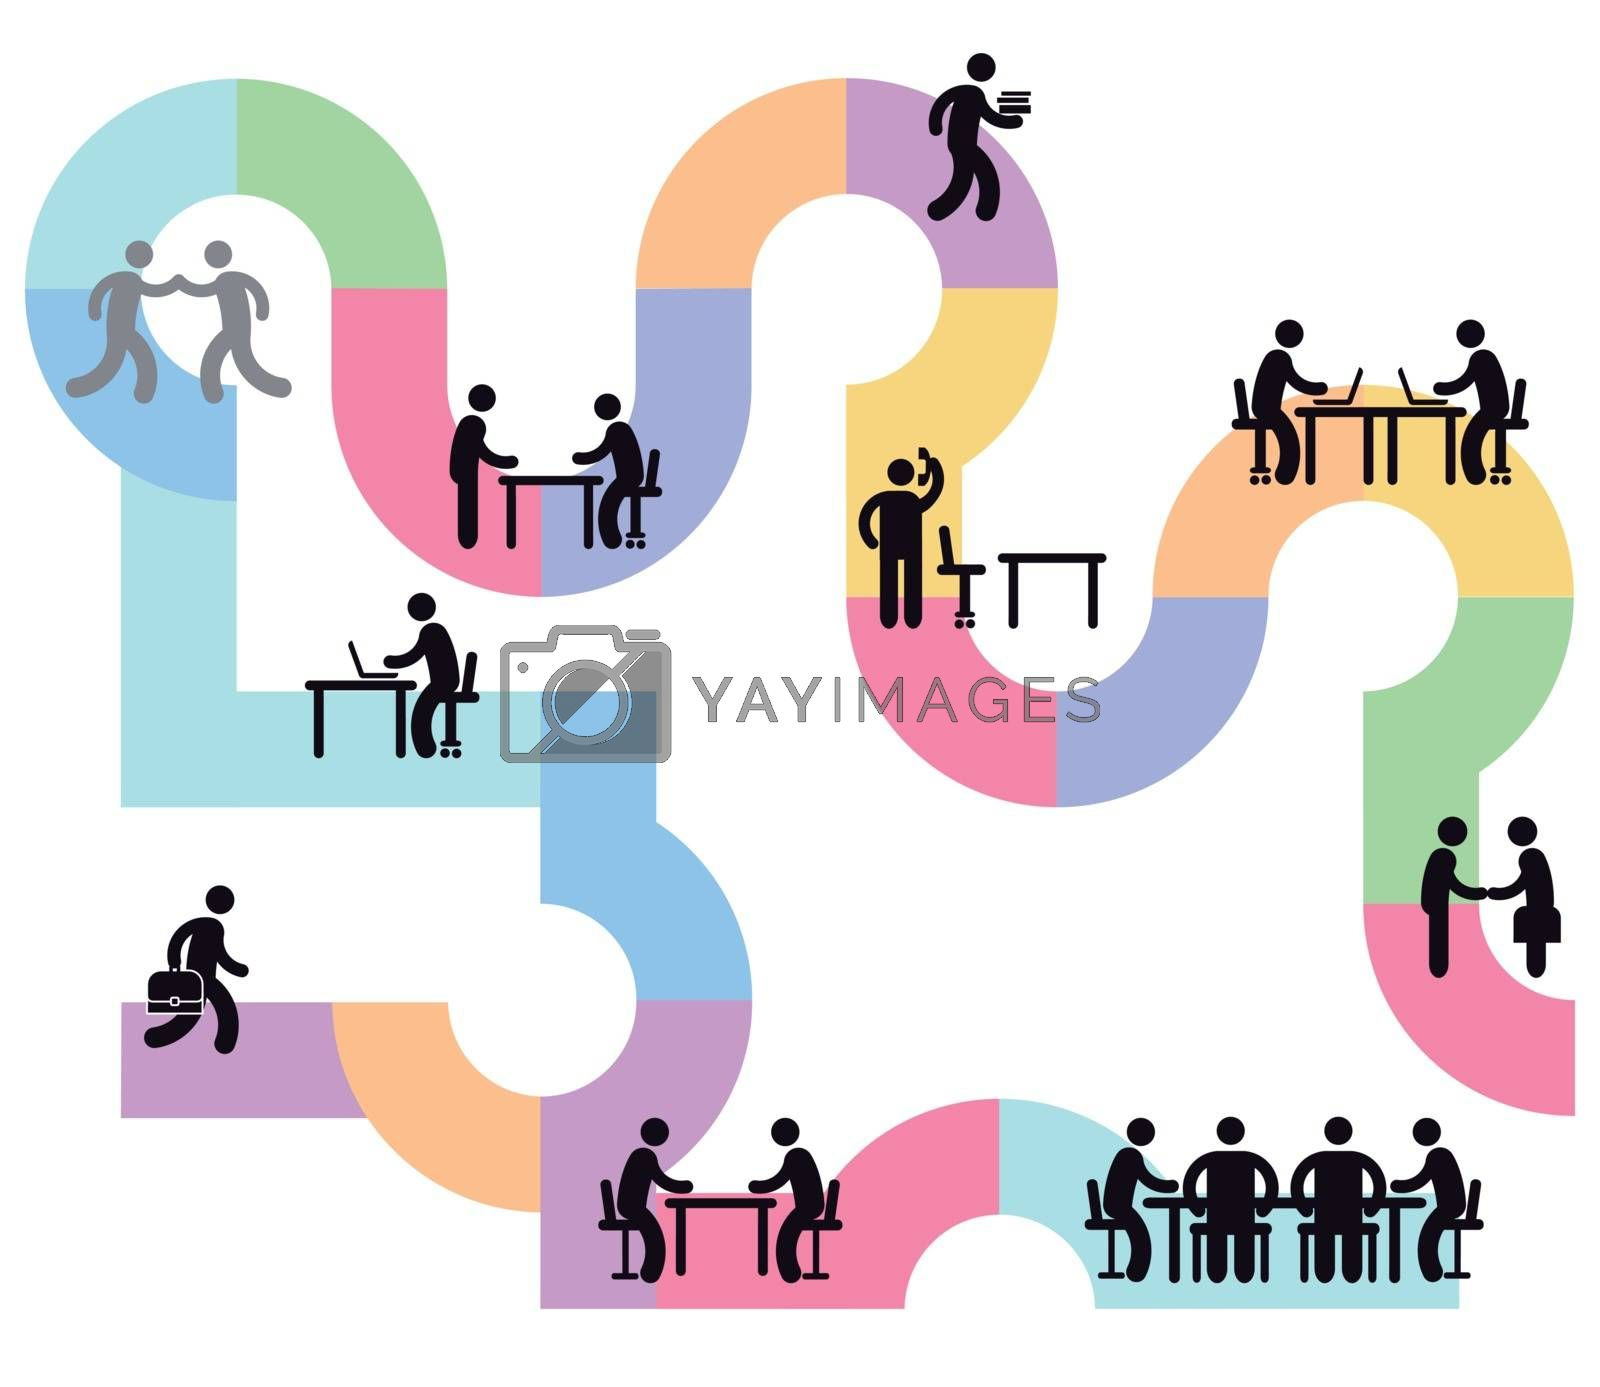 Business team and team work, workflowk